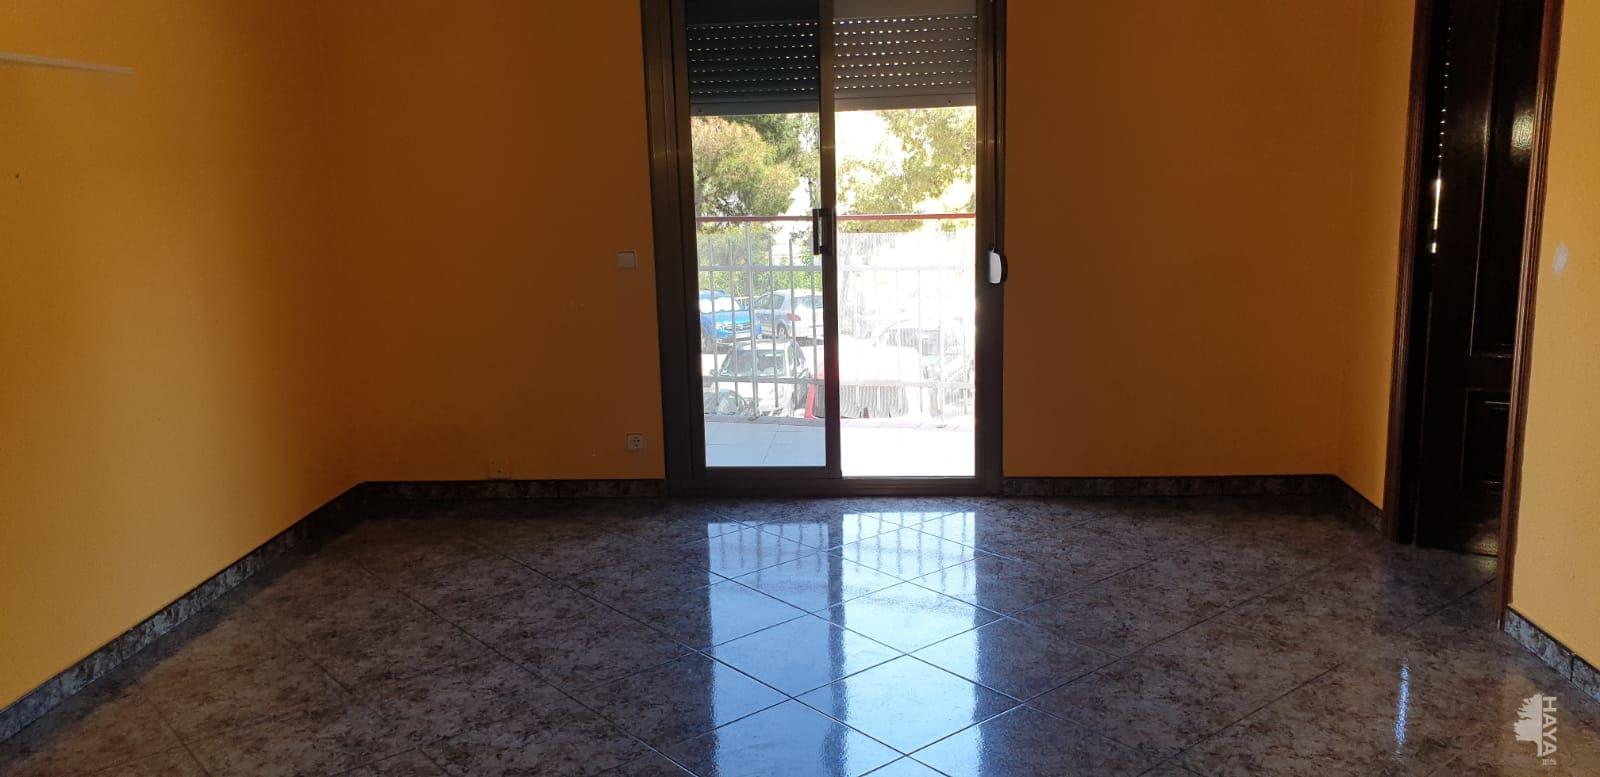 Piso en venta en Vilanova I la Geltrú, Barcelona, Avenida Francesc Macia, 149.975 €, 3 habitaciones, 1 baño, 60 m2